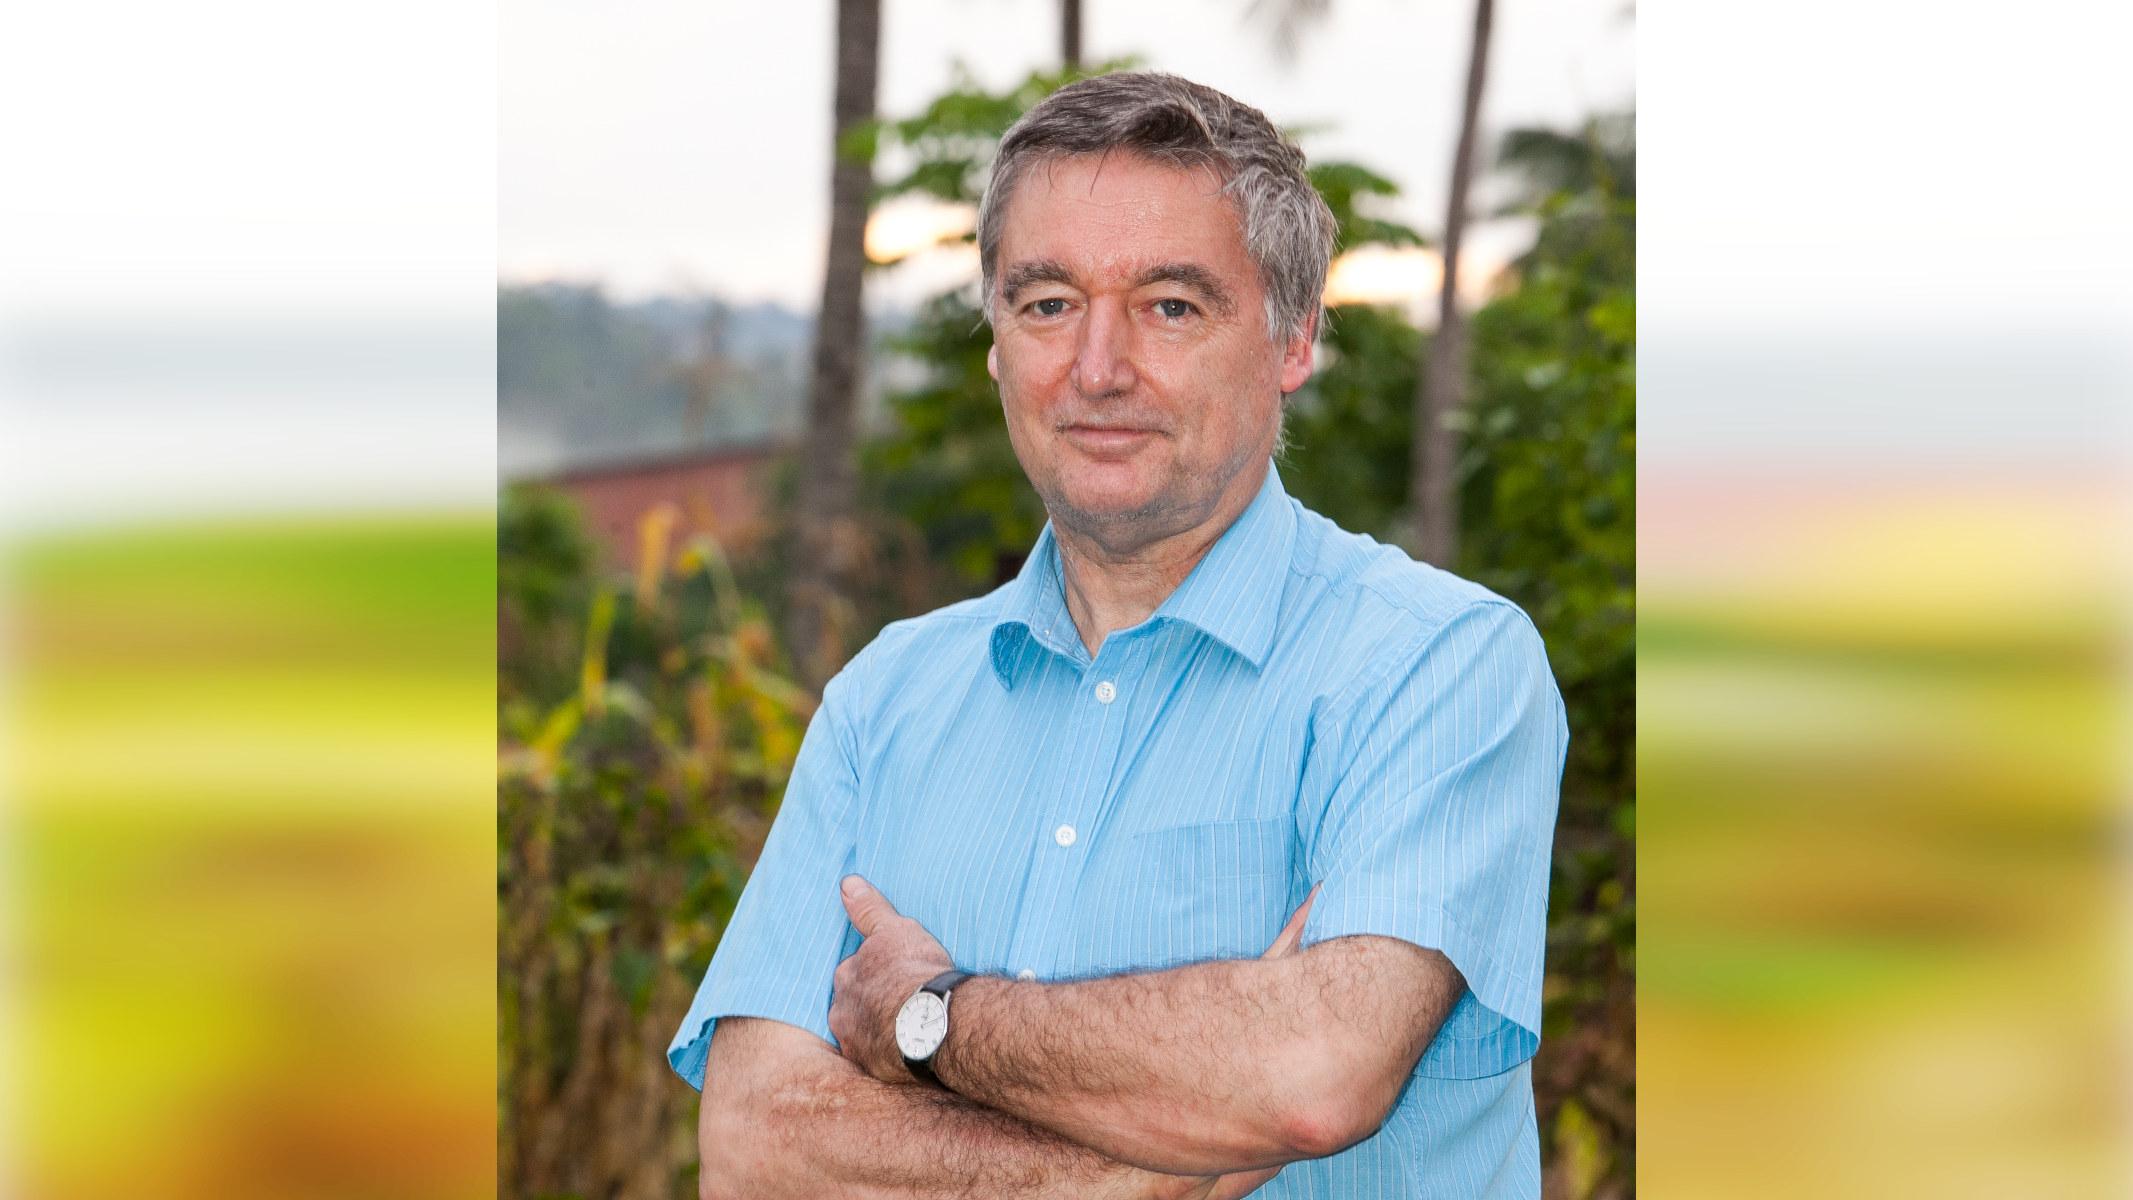 Philippe Matthijs